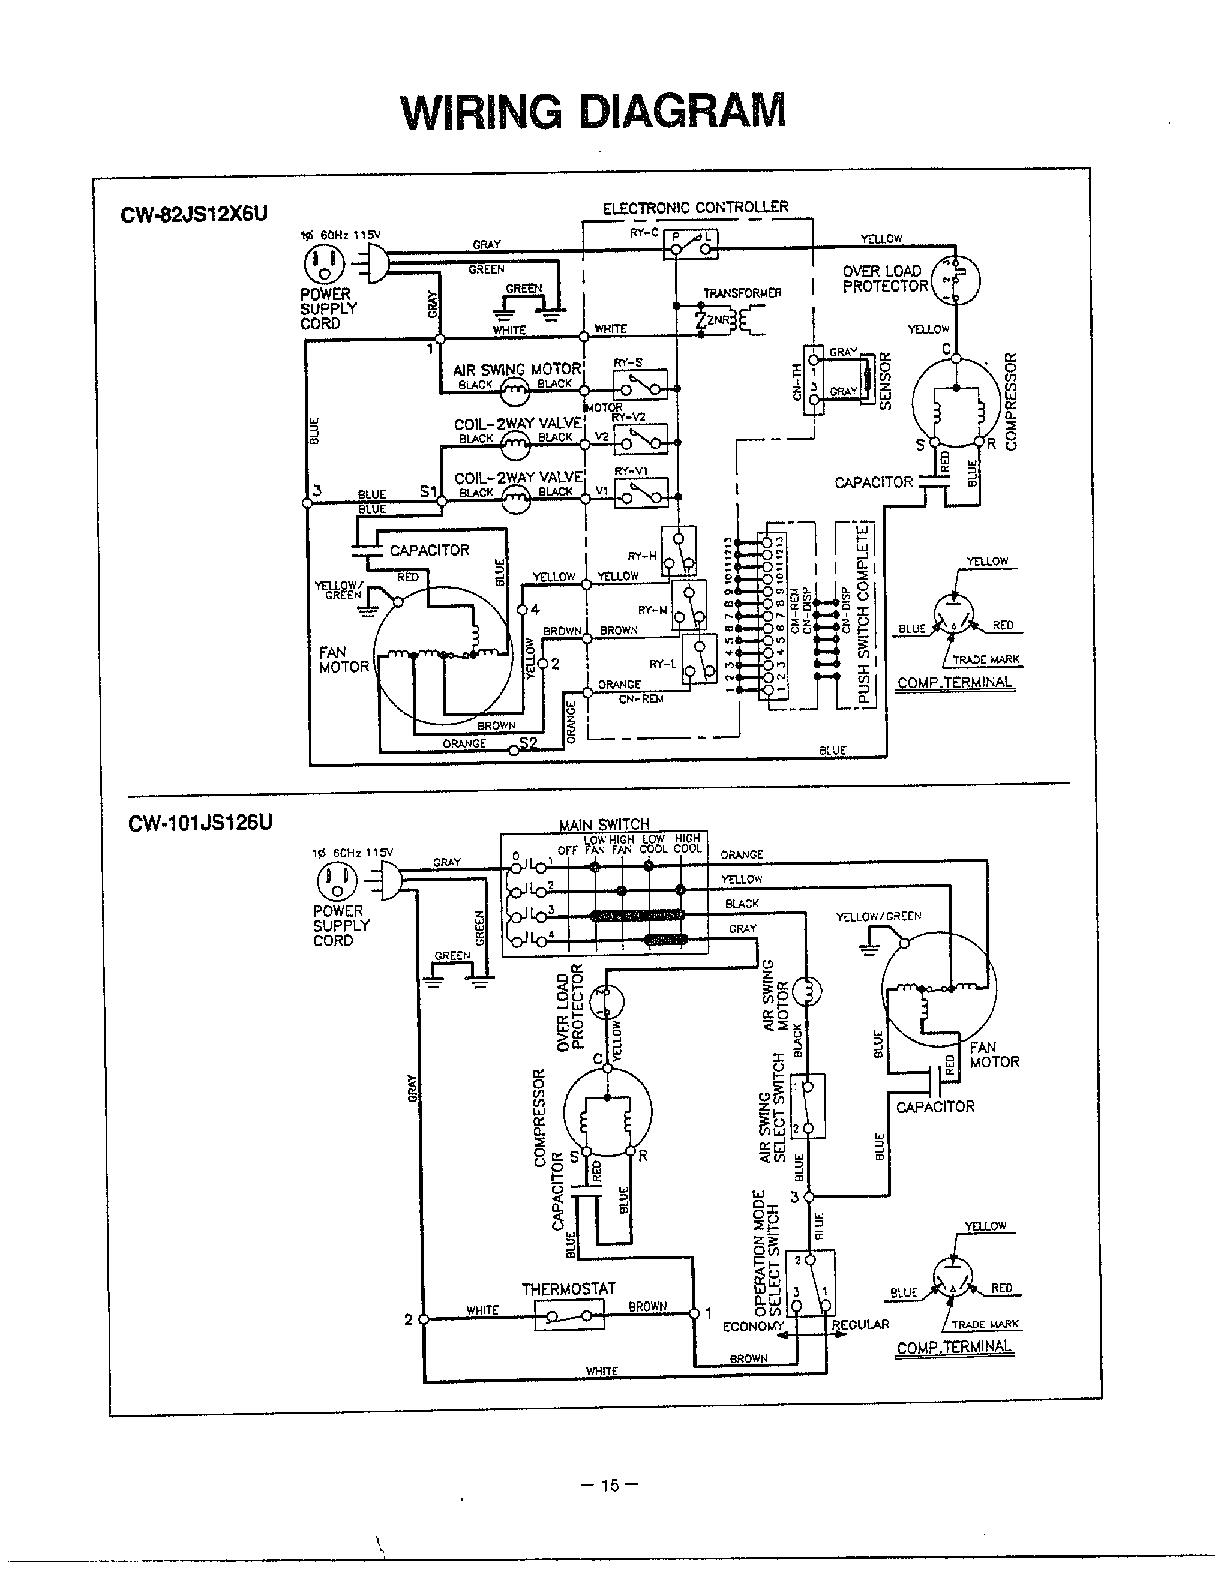 pana pacific radio wiring diagram   33 wiring diagram